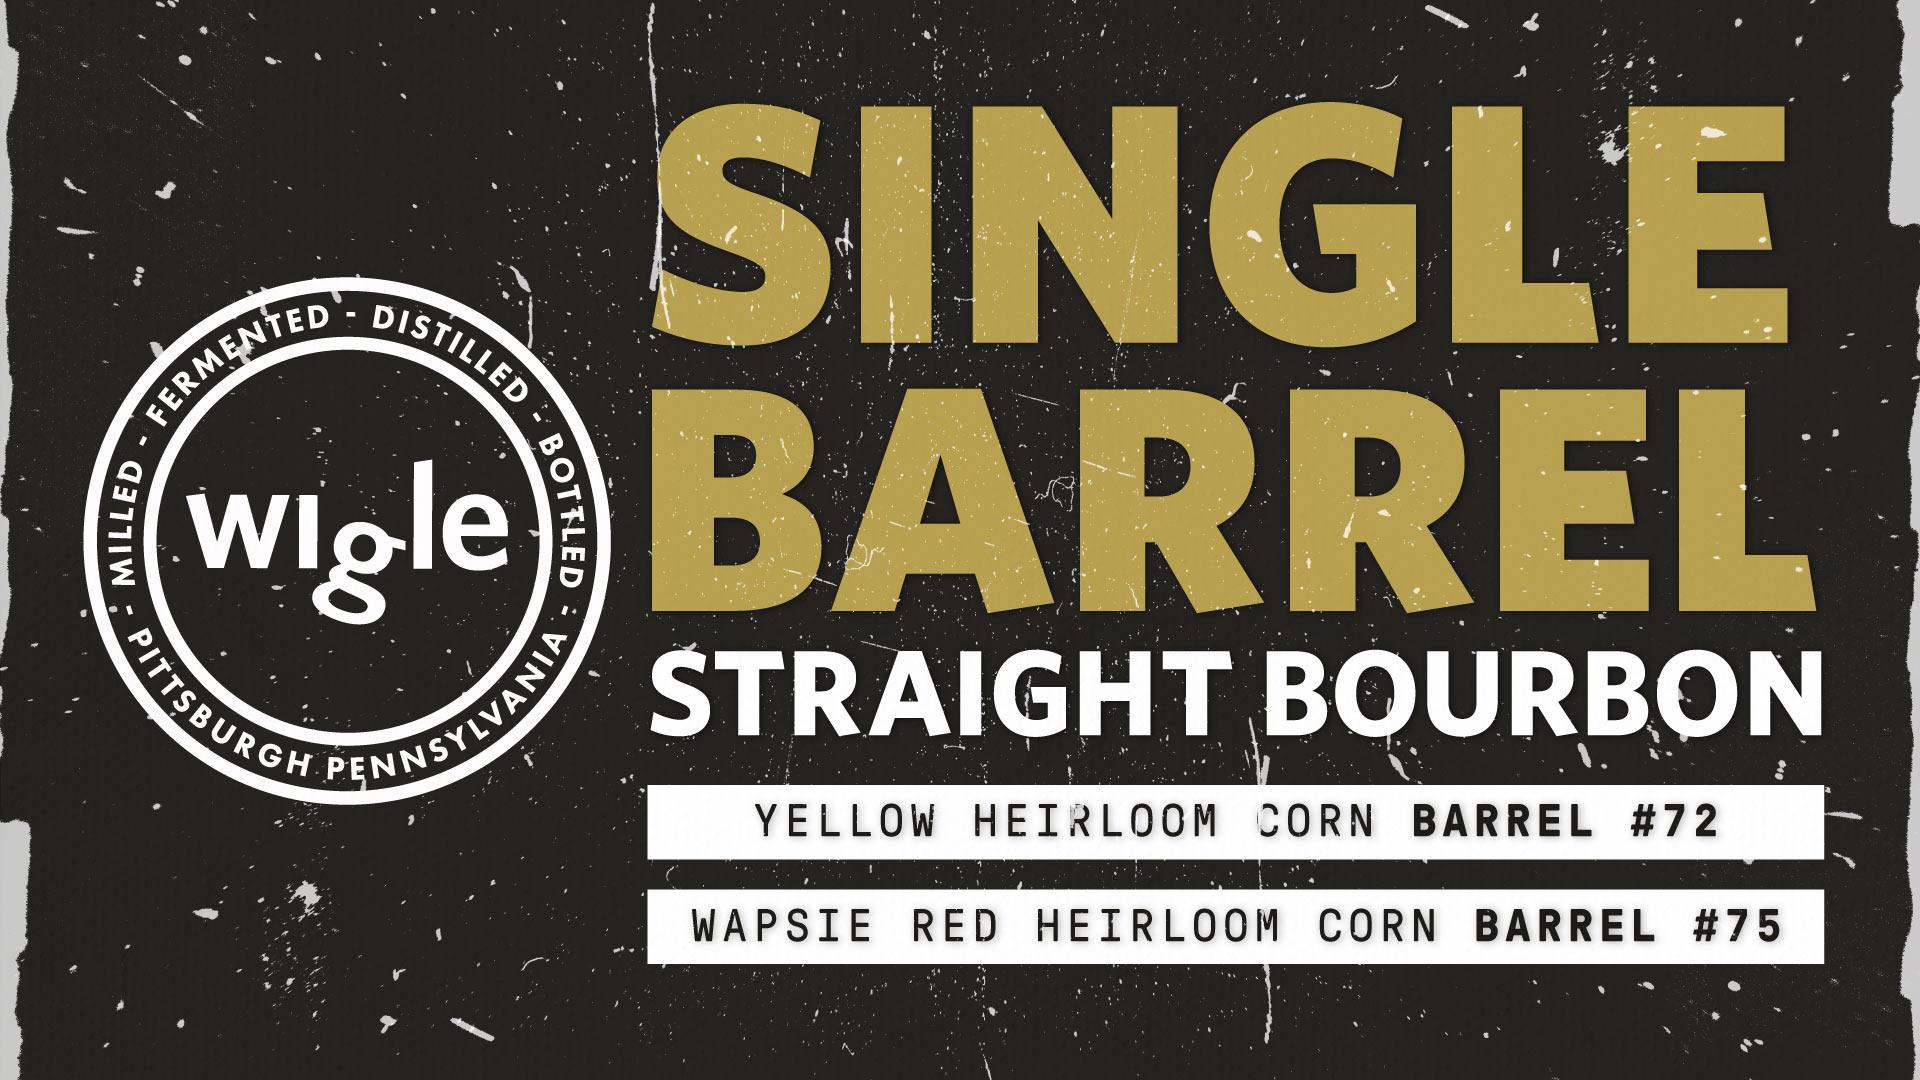 Wigle Single Barrel Bourbon Releases